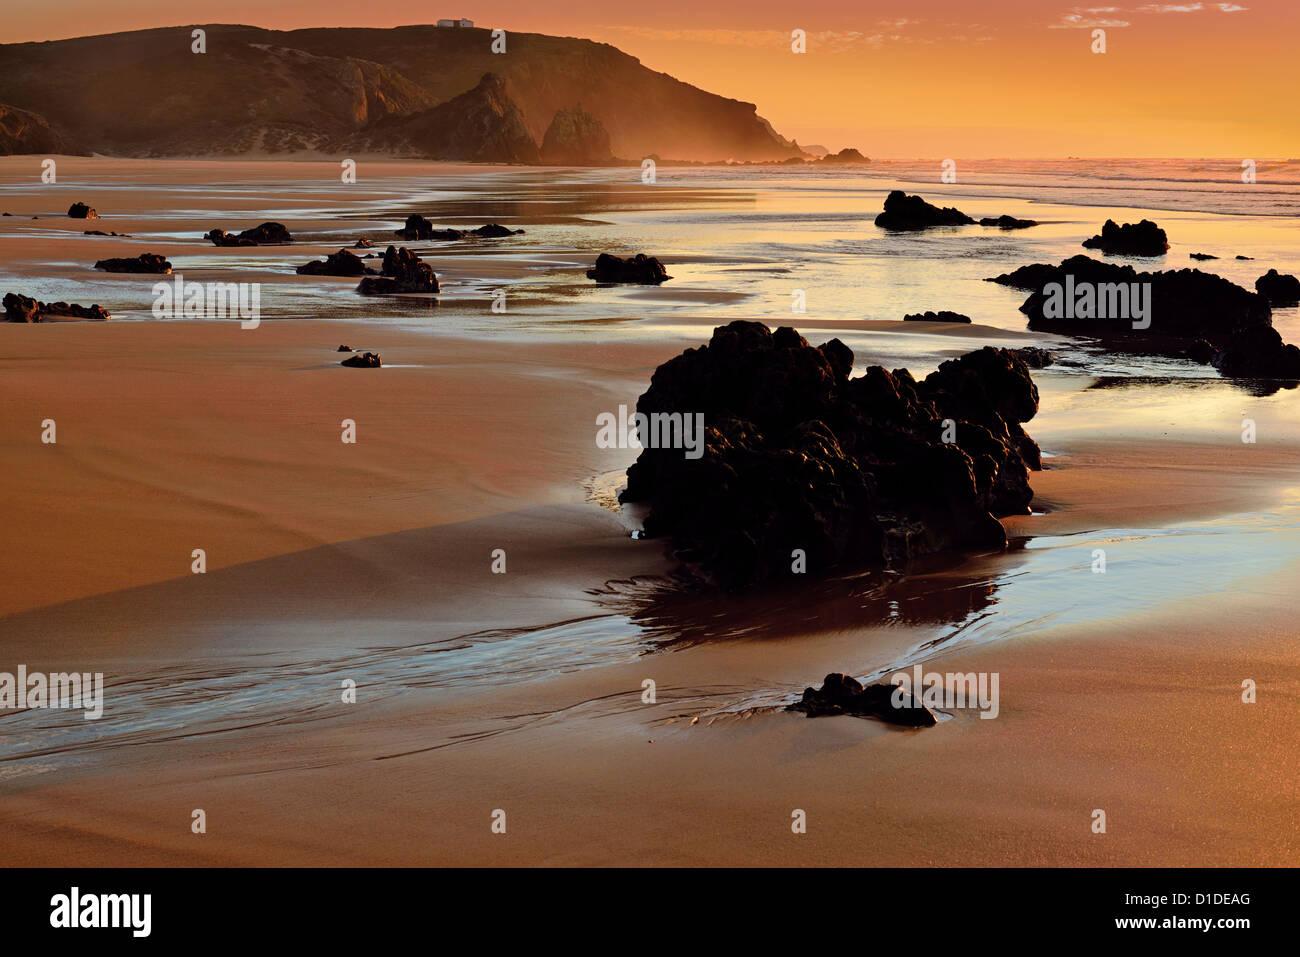 Portugal, Algarve: Romantic sunset at beach Praia do Amado Stock Photo